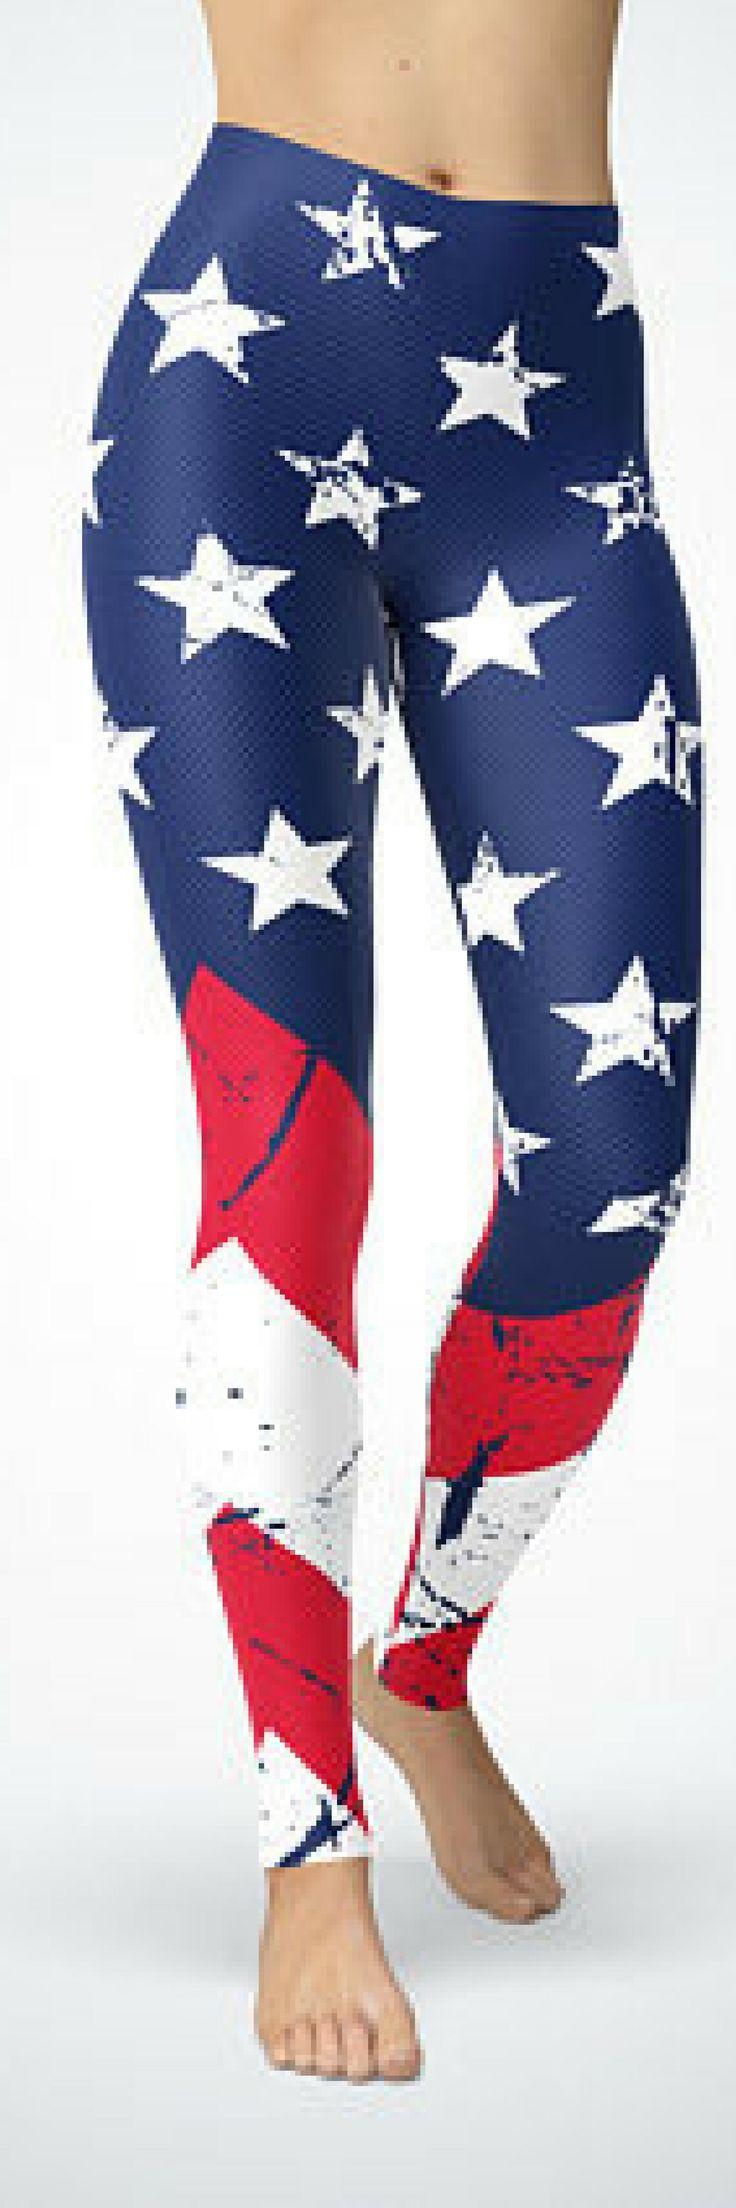 American Flag Leggings USA  Flag Clothing Yoga Leggings Blue Red Capri Pants American Flag Stars  Stripes Patriotic Yoga Pants United States   #workoutclothes #ad #womensfashion #cuteoutfits